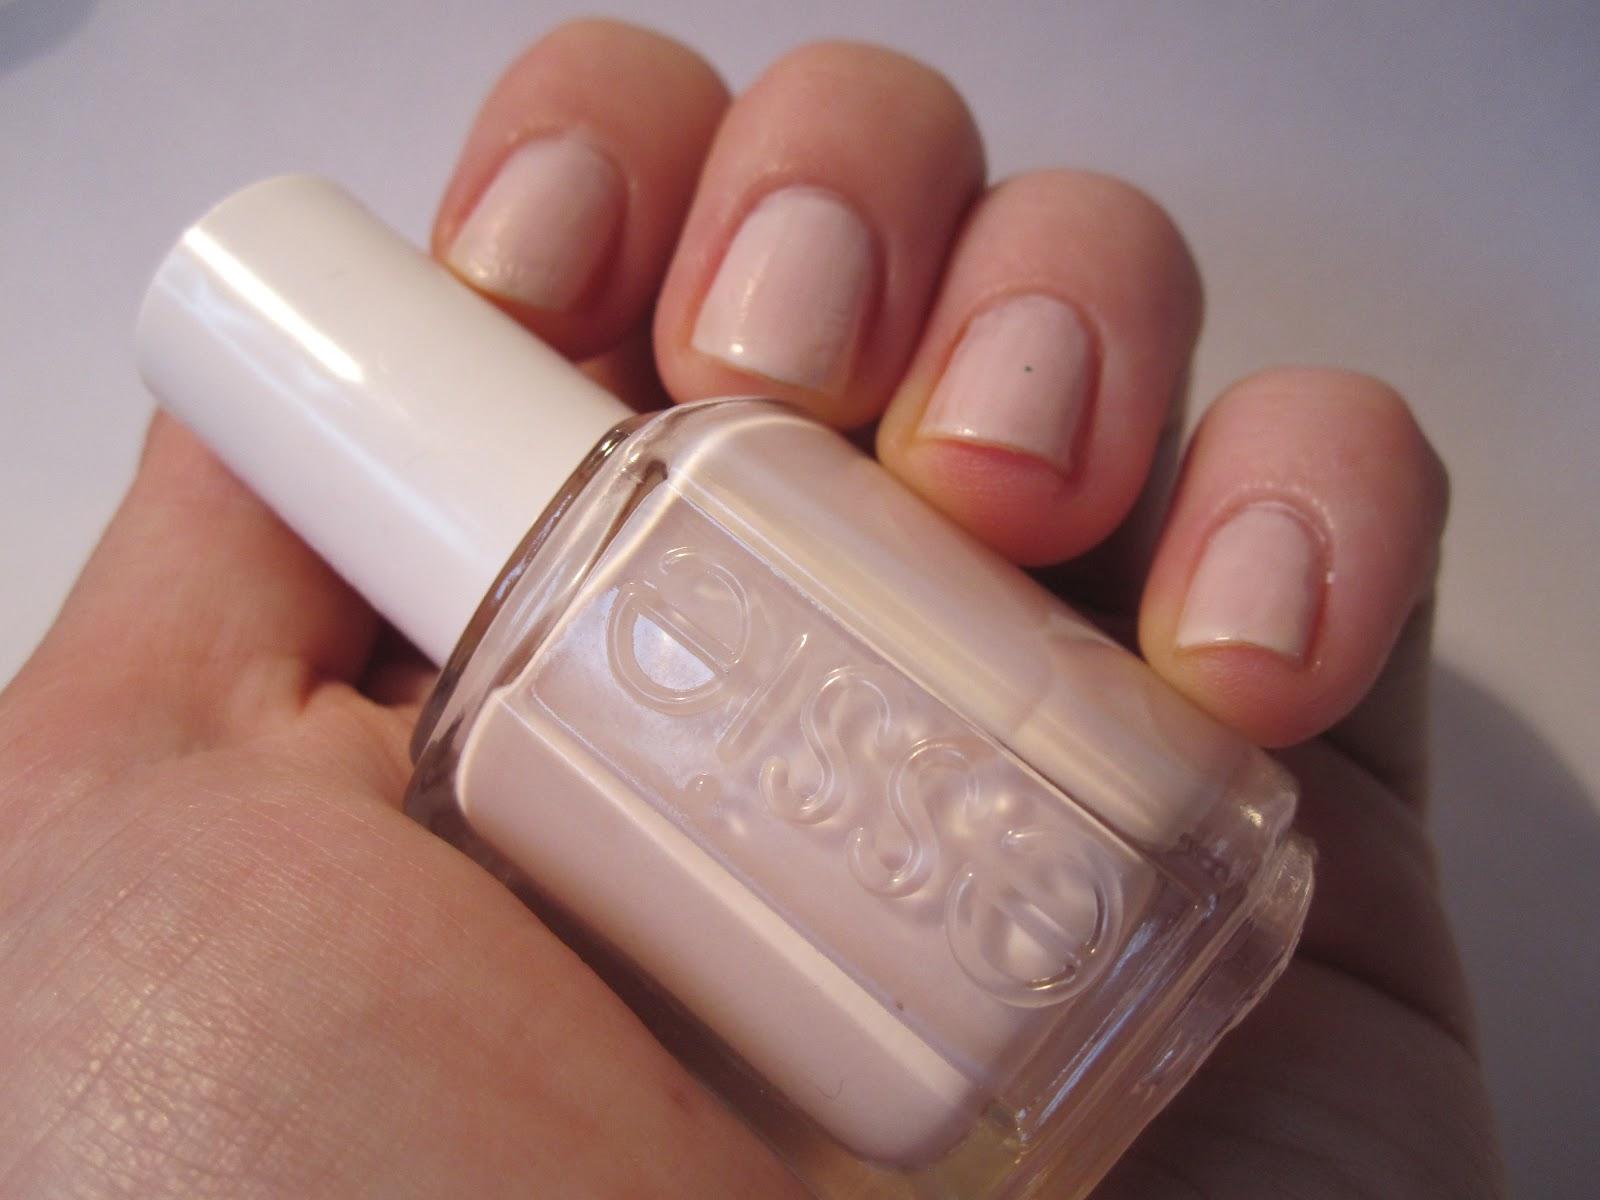 Essie Allure Nail Polish Shade Review - marieclaire.com